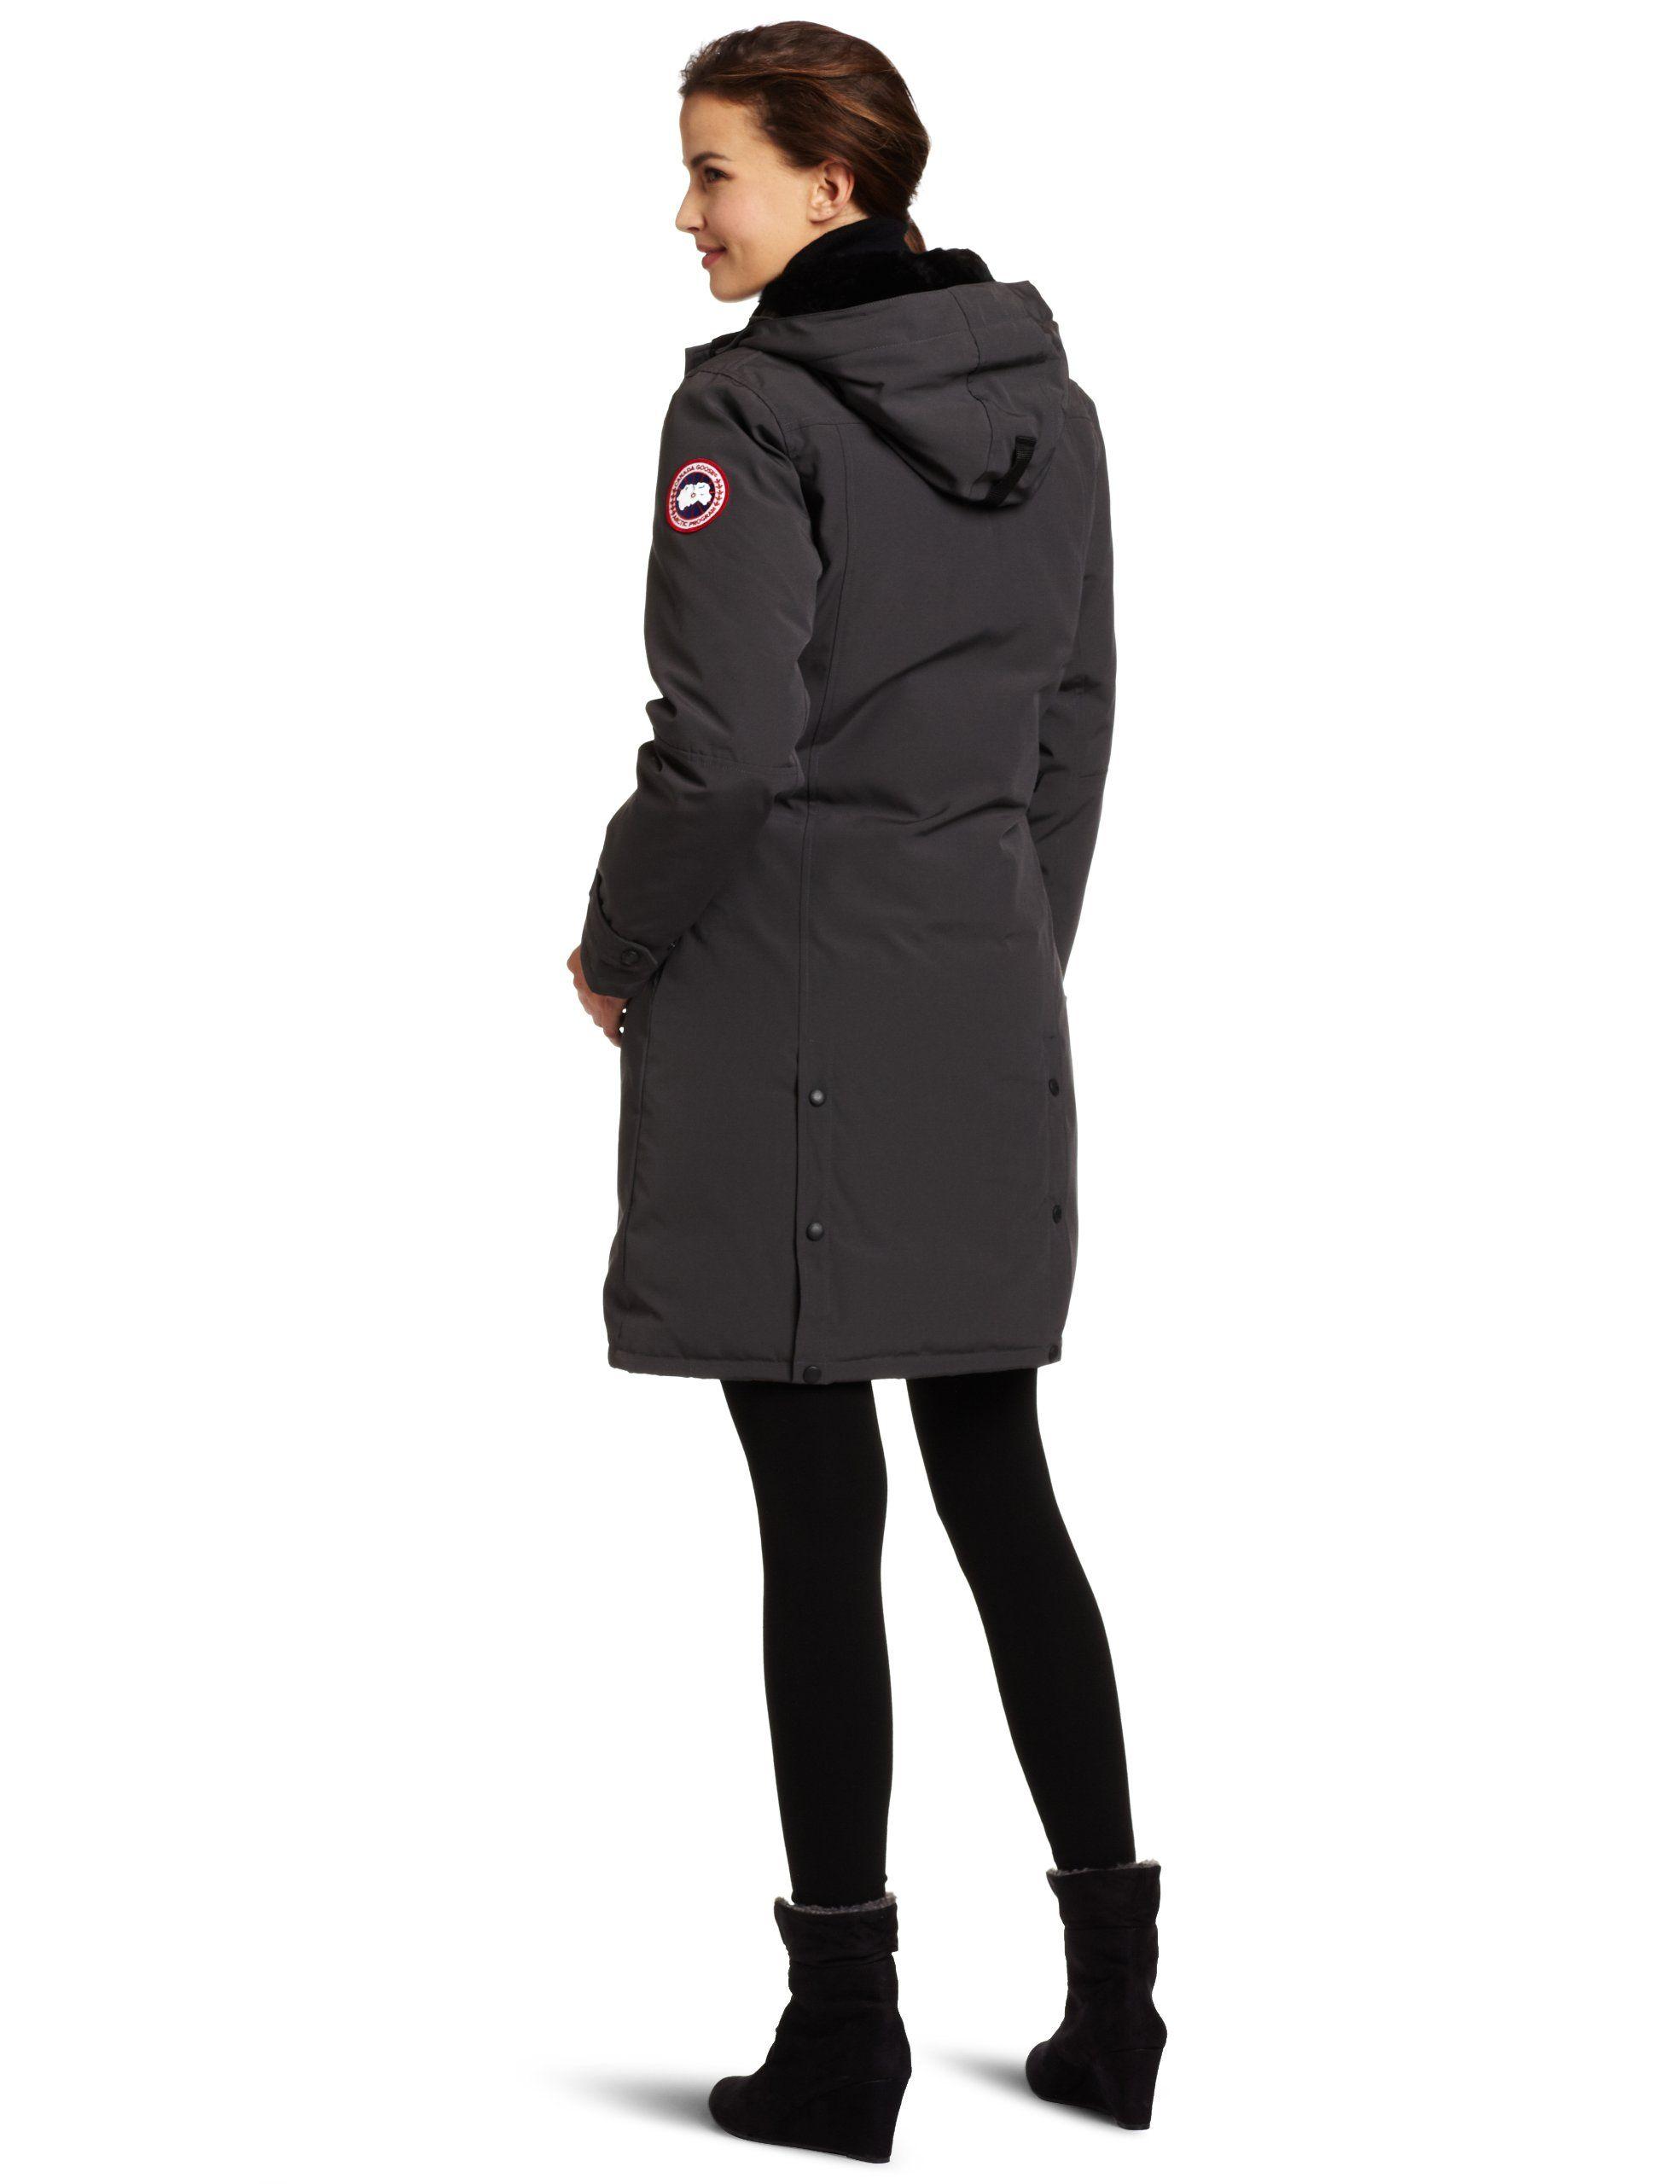 Amazon Com Canada Goose Women S Kensington Parka Coat Skiing Jackets Clothing Kensington Parka Canada Goose Women Parka Coat